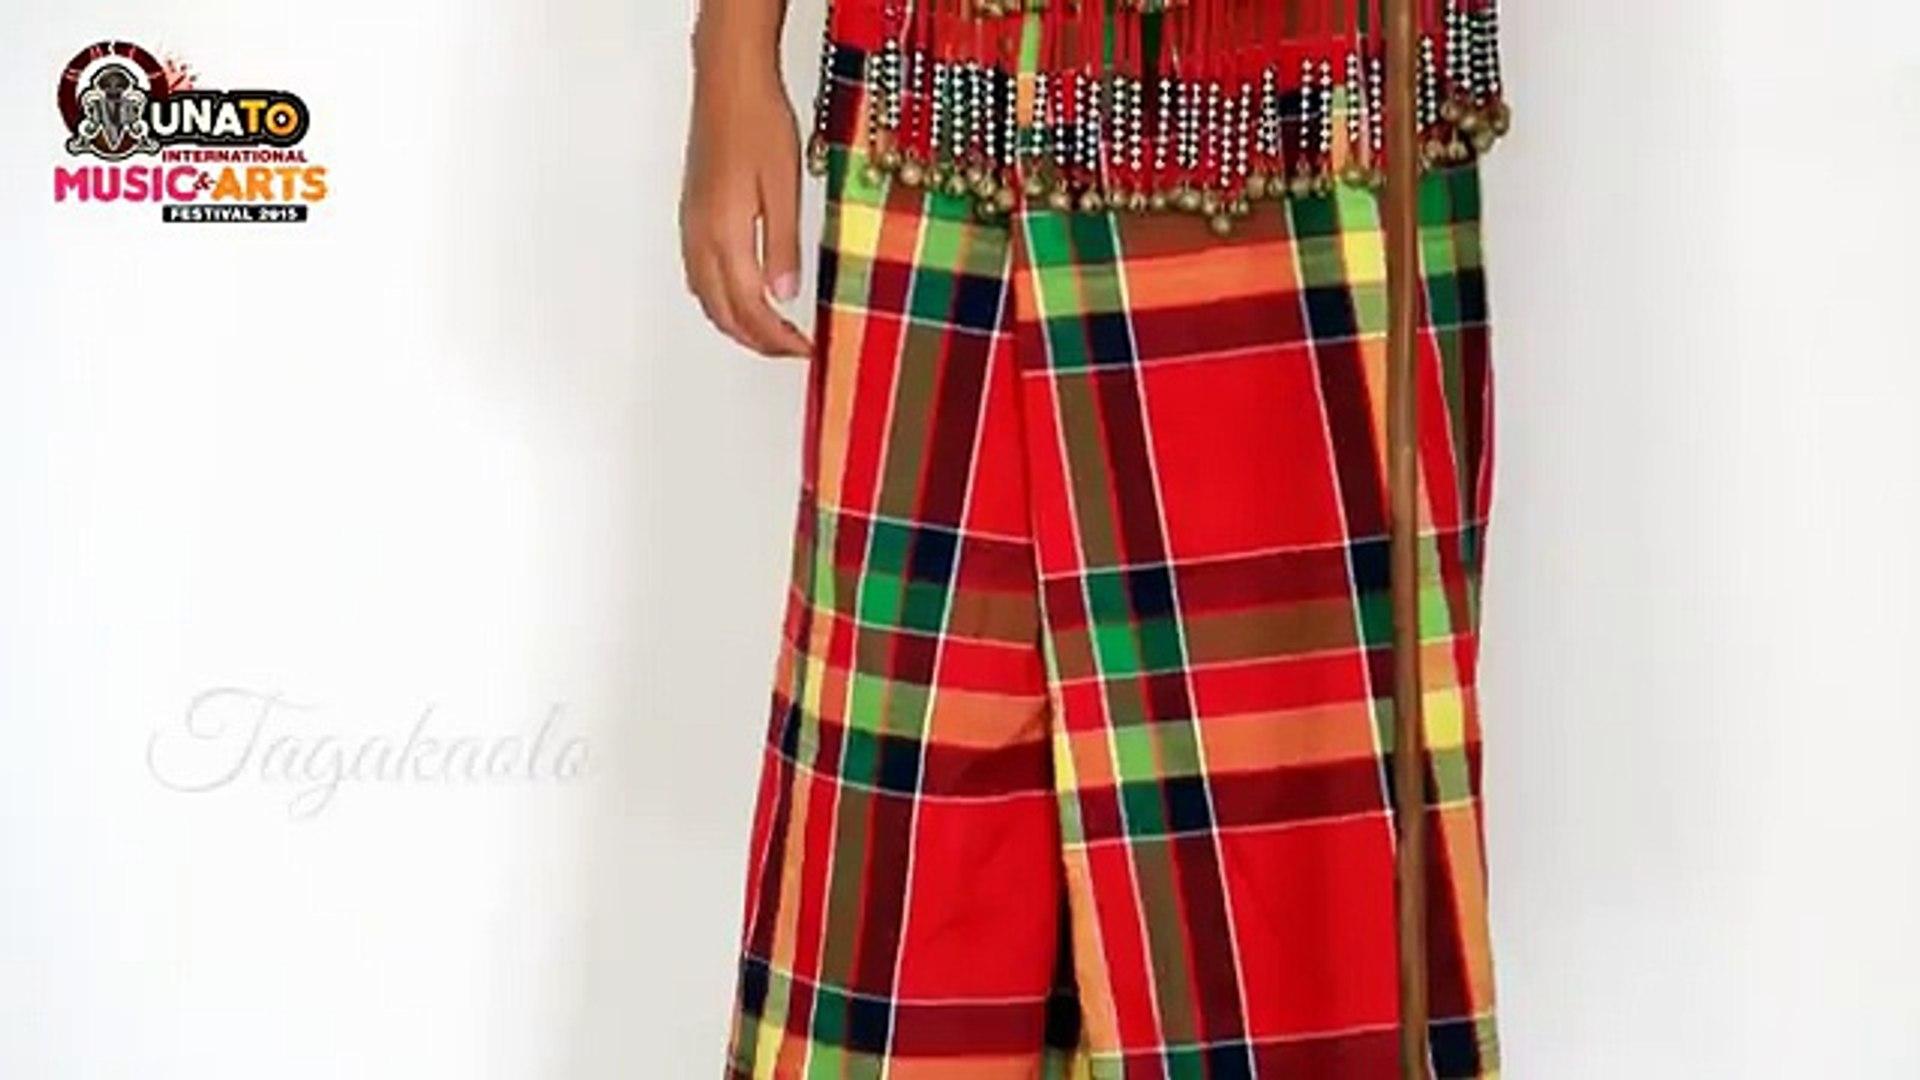 Sarangani Beauty - Fashion (Clothes Transformation)